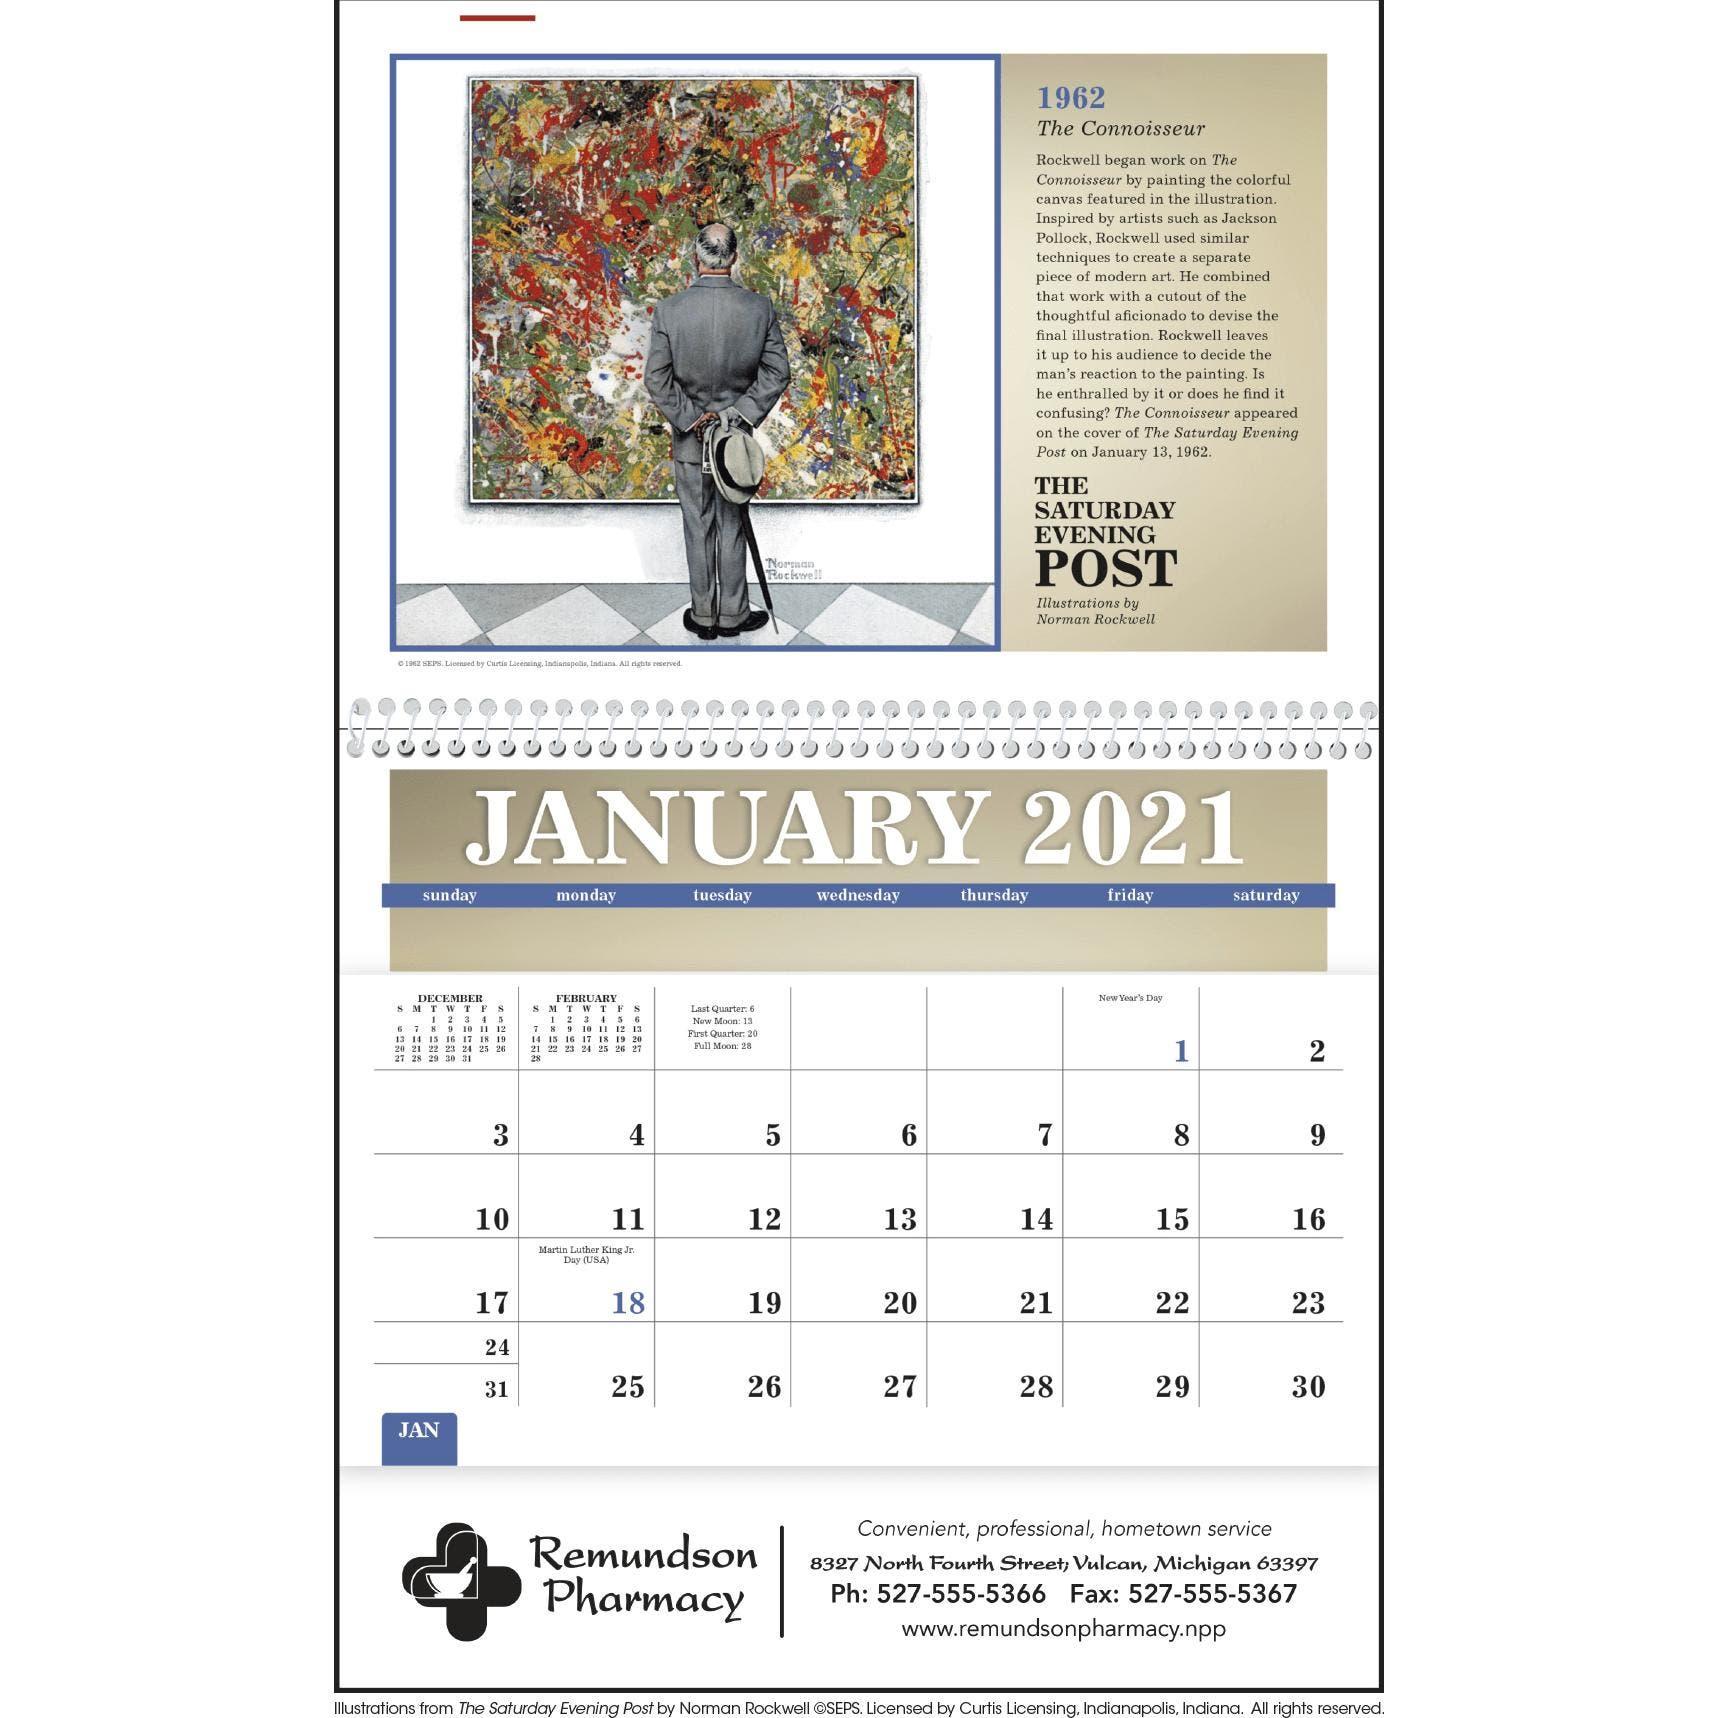 Saturday Evening Post Pocket Calendar (2021) pertaining to Free Hallmark Pocket Calendars